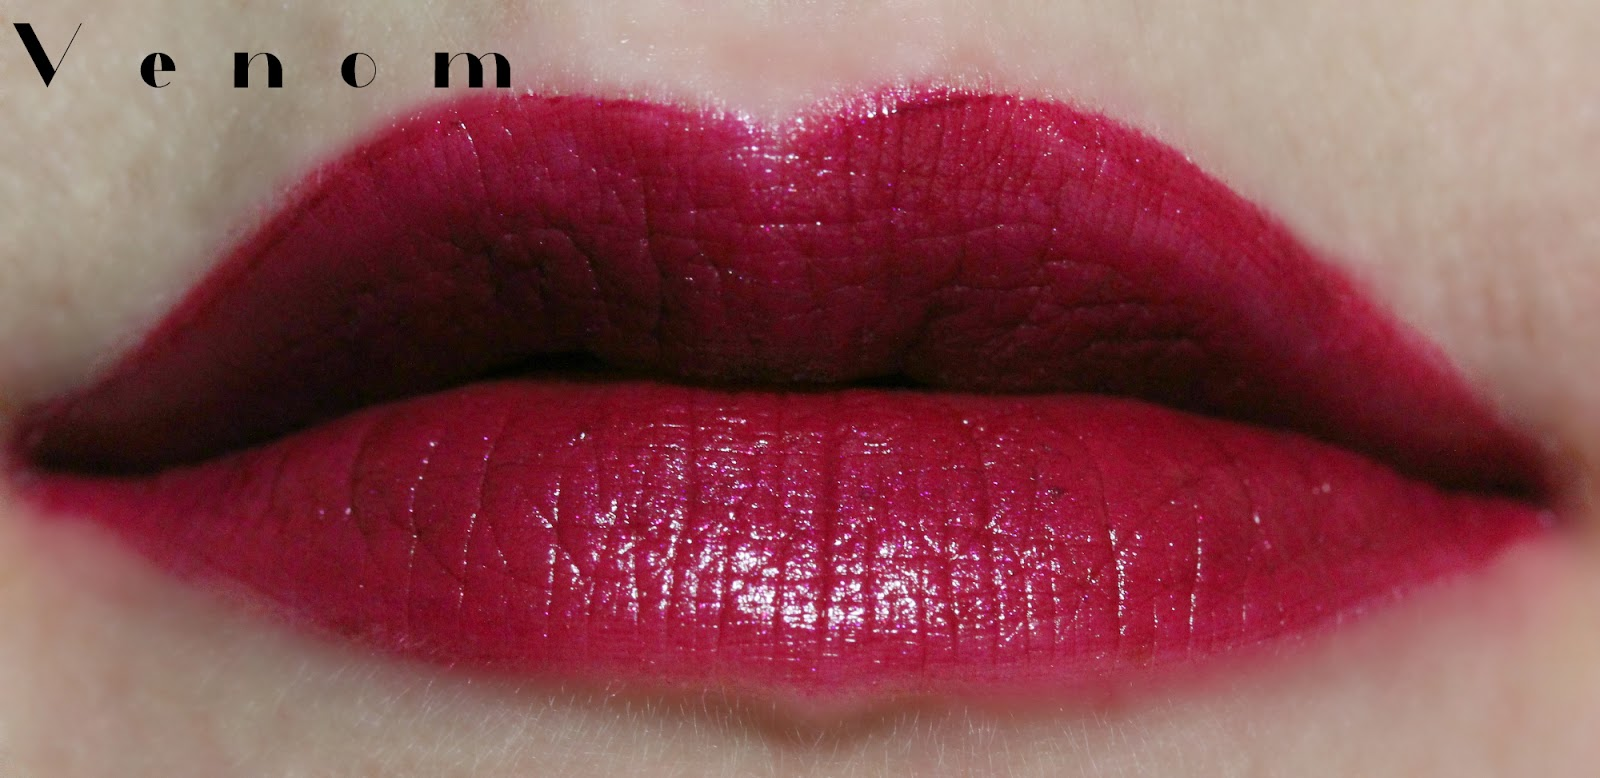 Urban Decay Venom lipstick